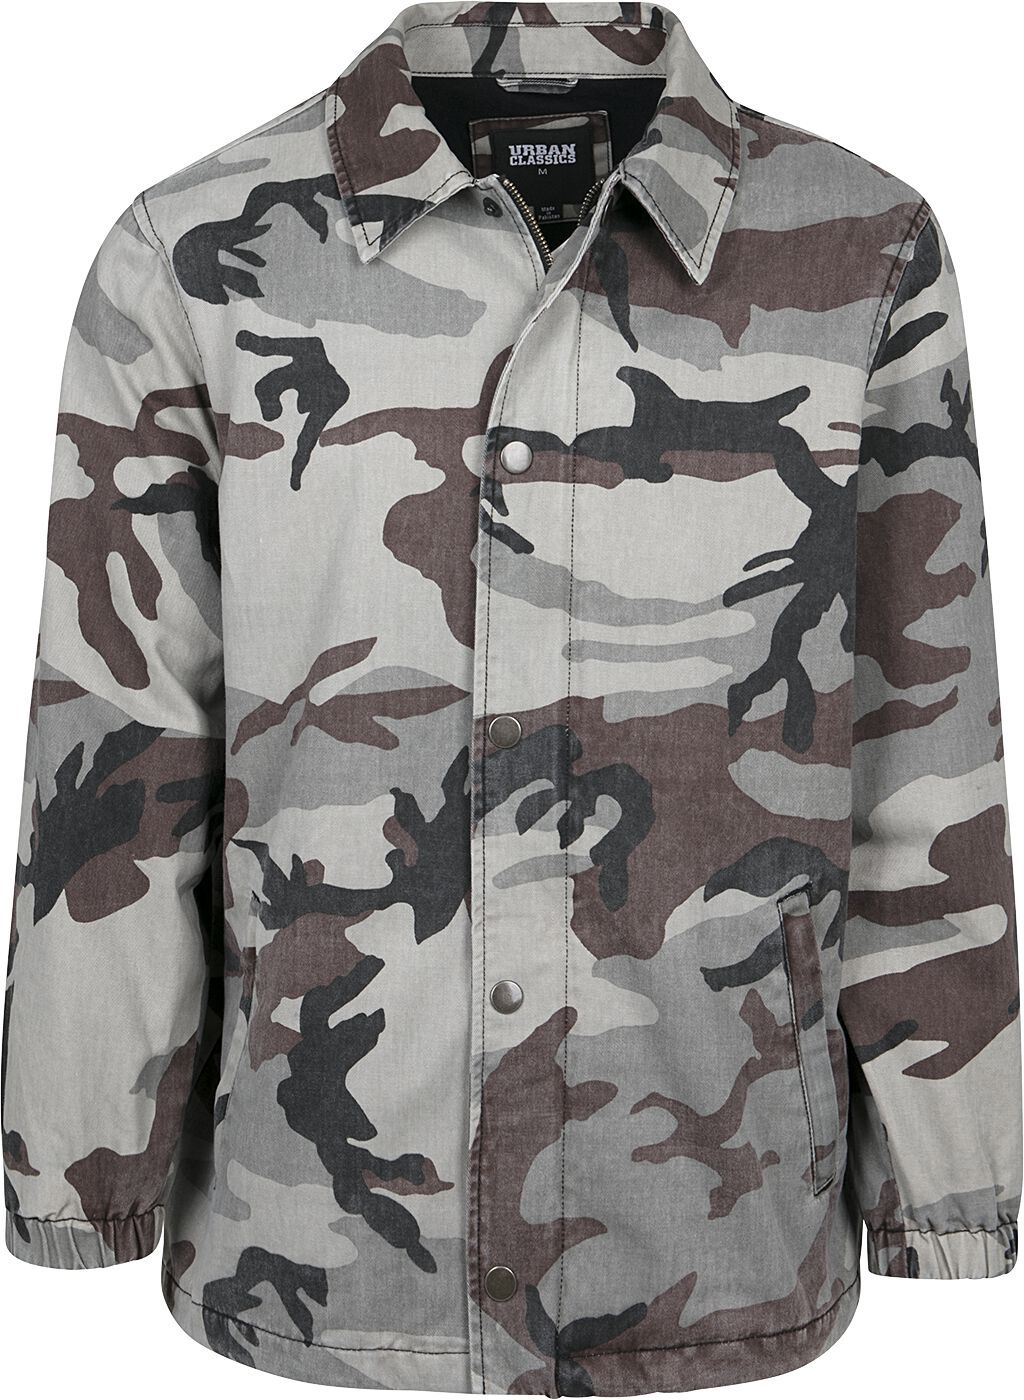 Image of   Urban Classics Camo Cotton Coach Jacket Jakke grå-camo